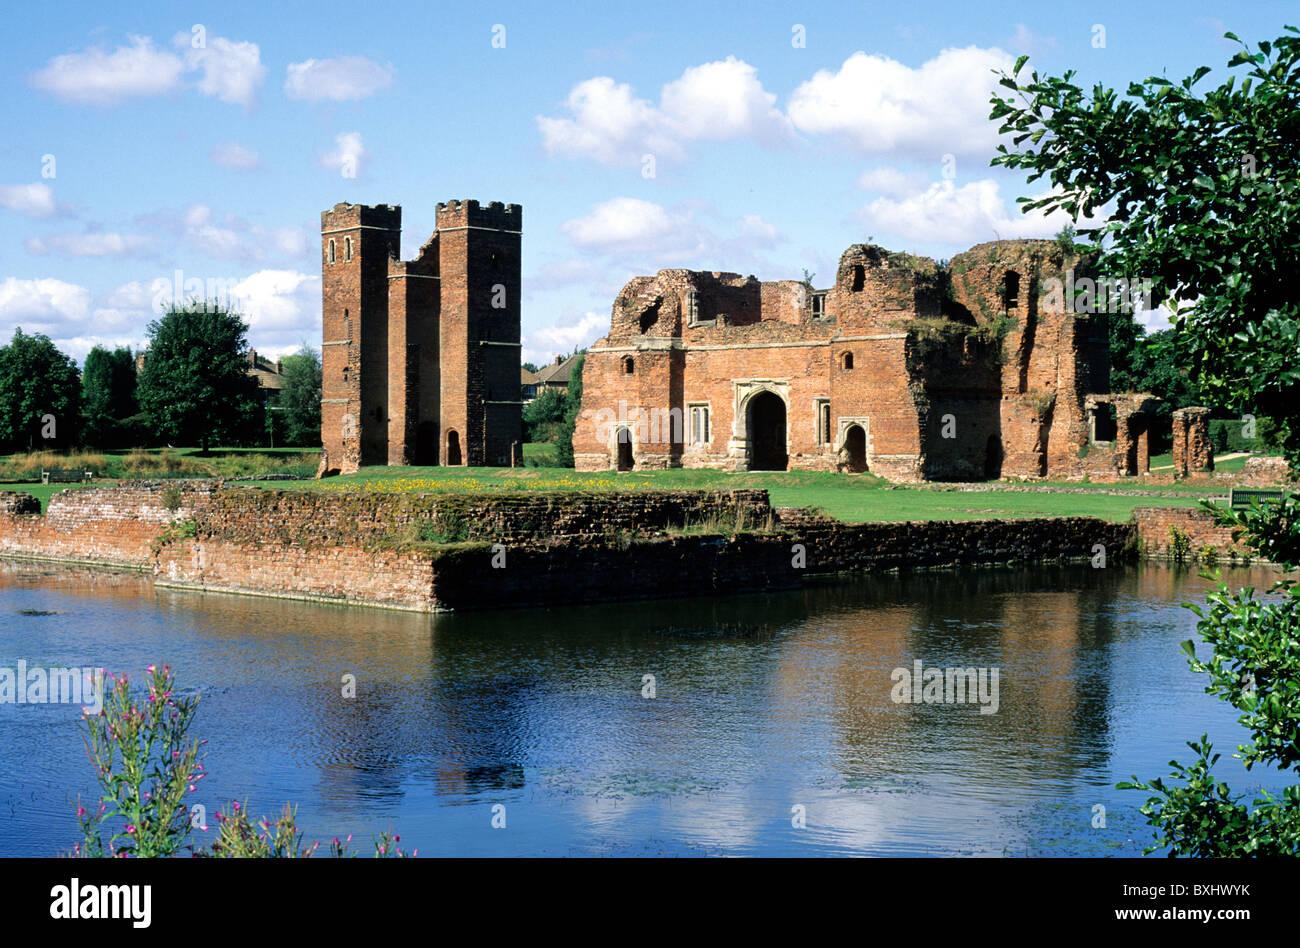 Kirby Muxloe Castle And Moat Leicestershire England Uk